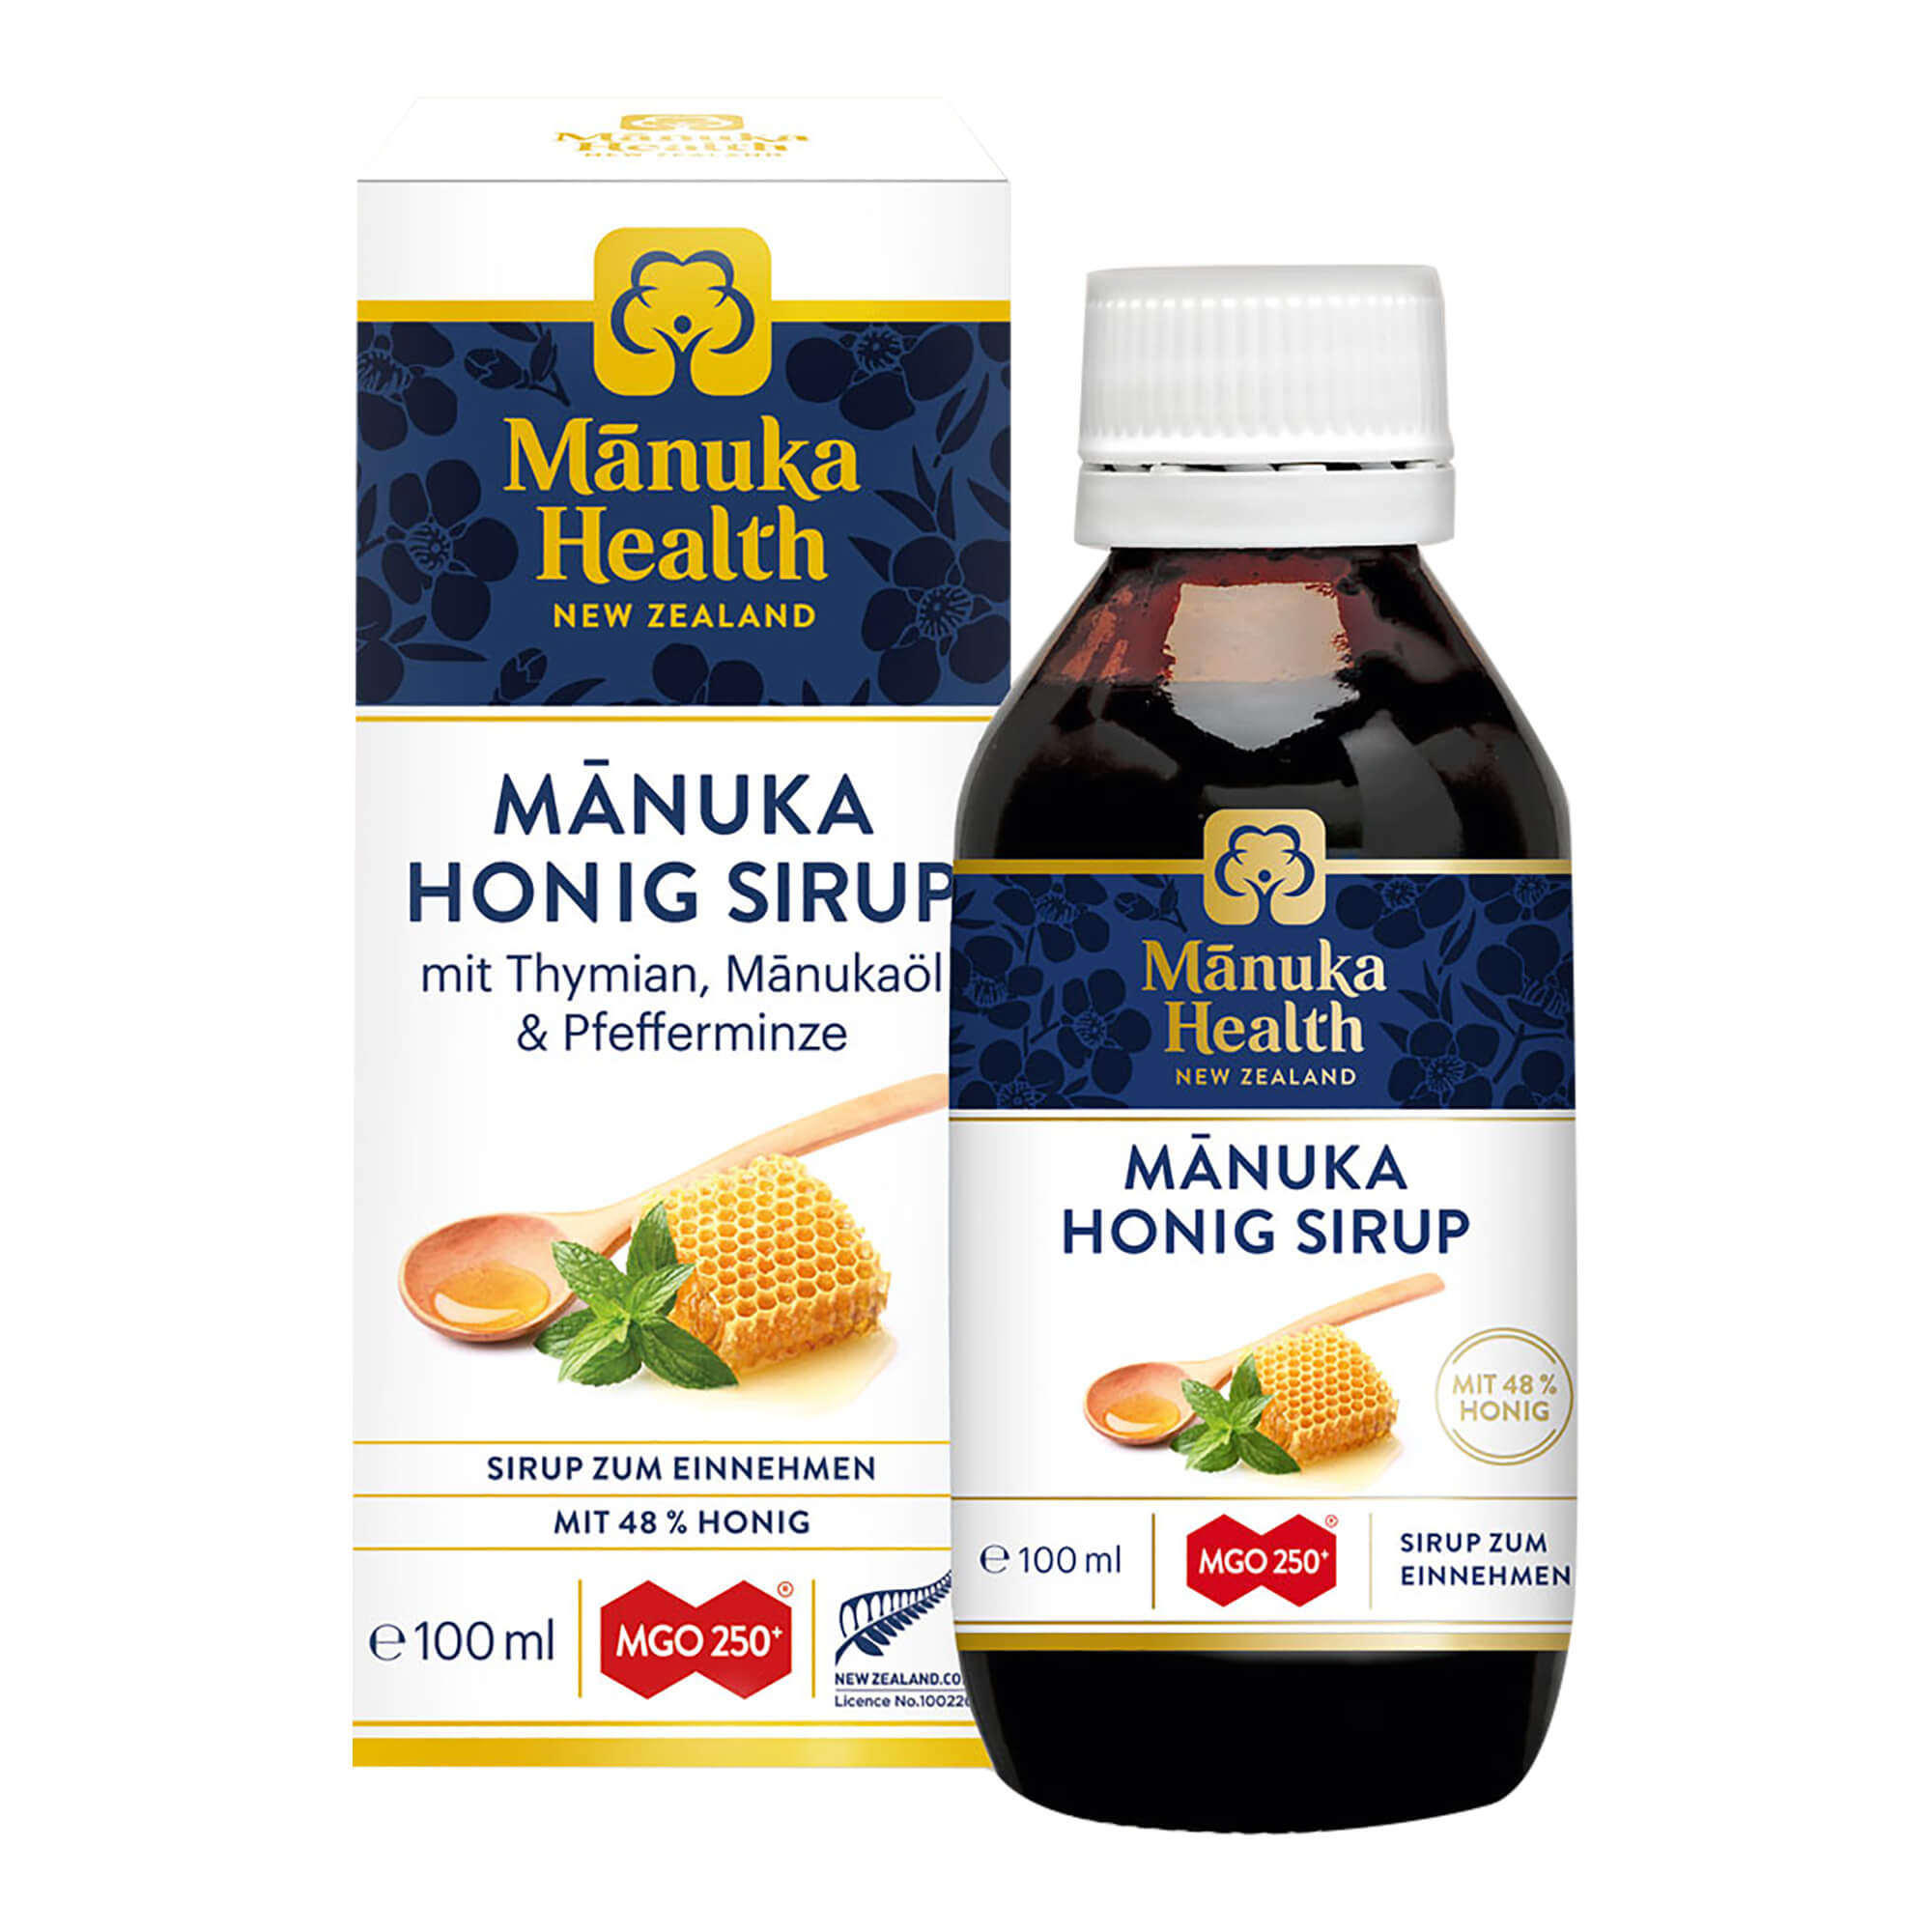 Manuka Health Honig Sirup MGO 250+